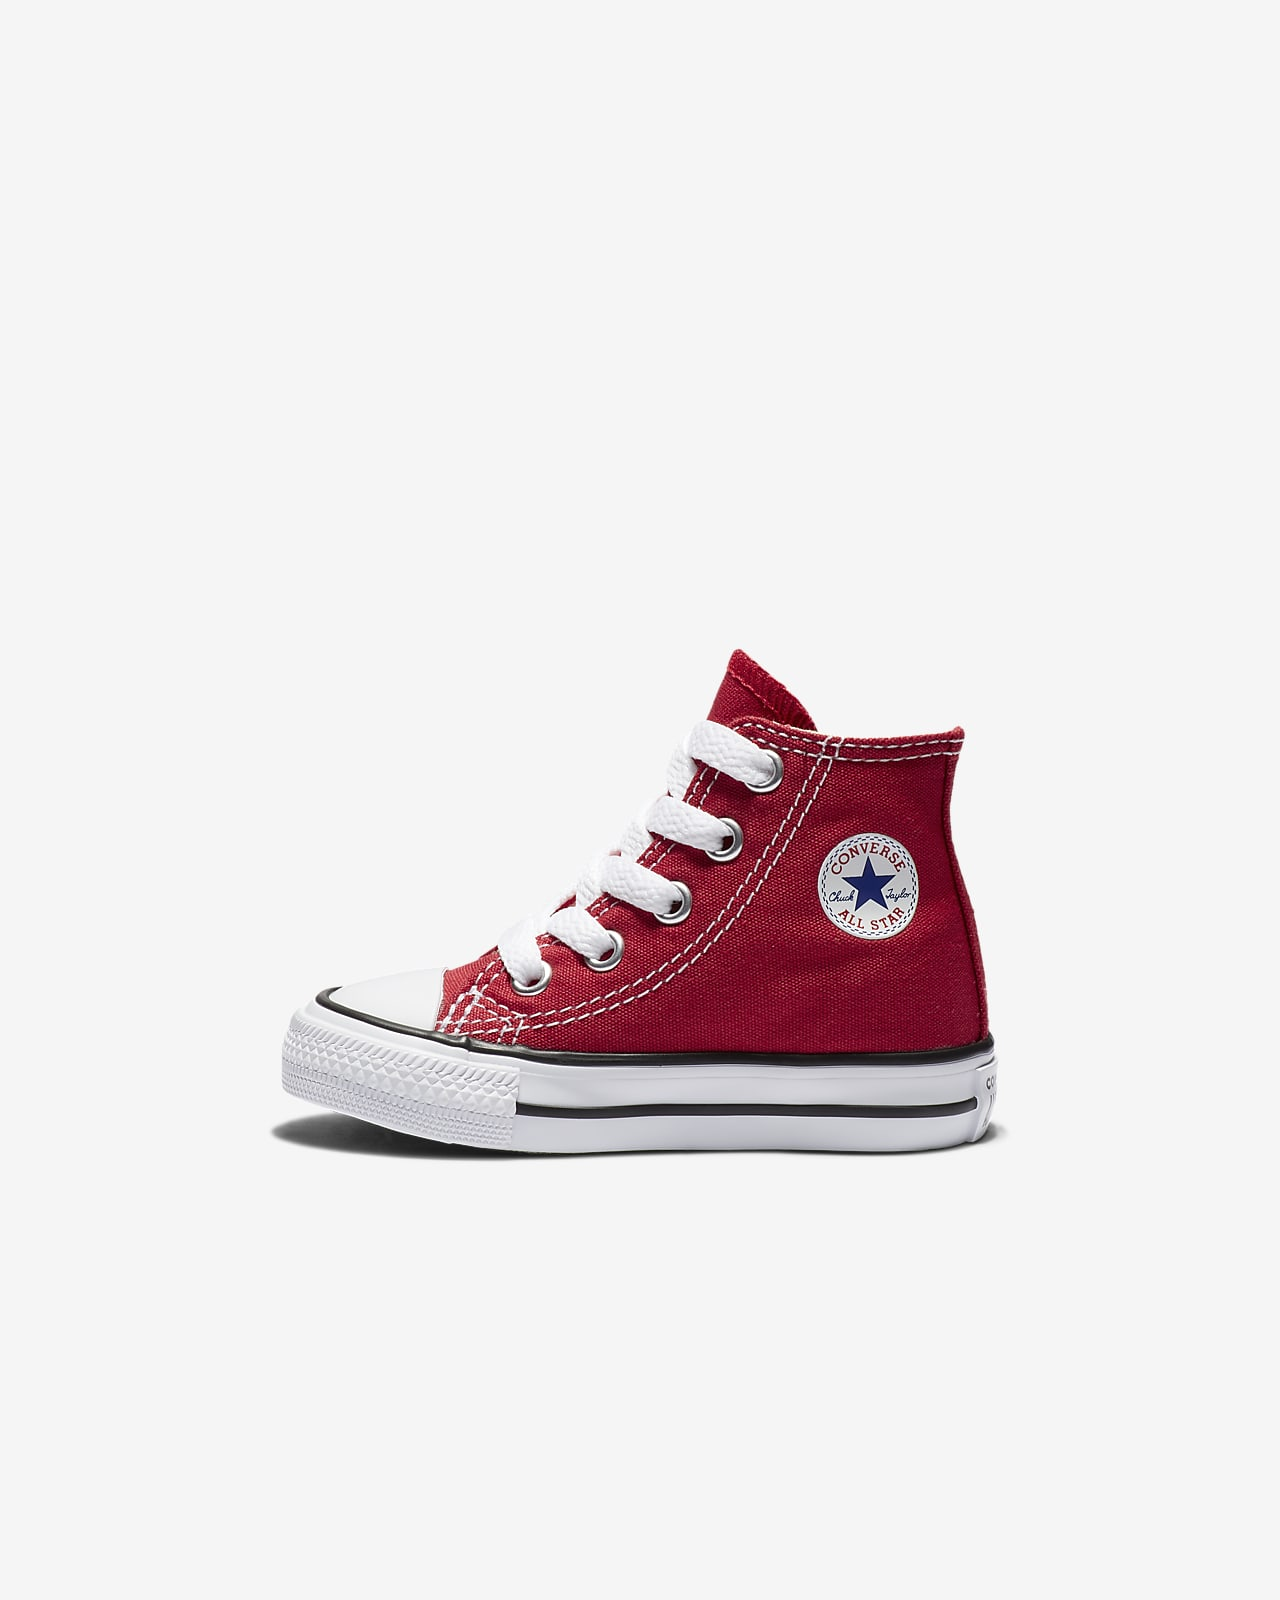 2c-10c) Infant/Toddler Shoe. Nike